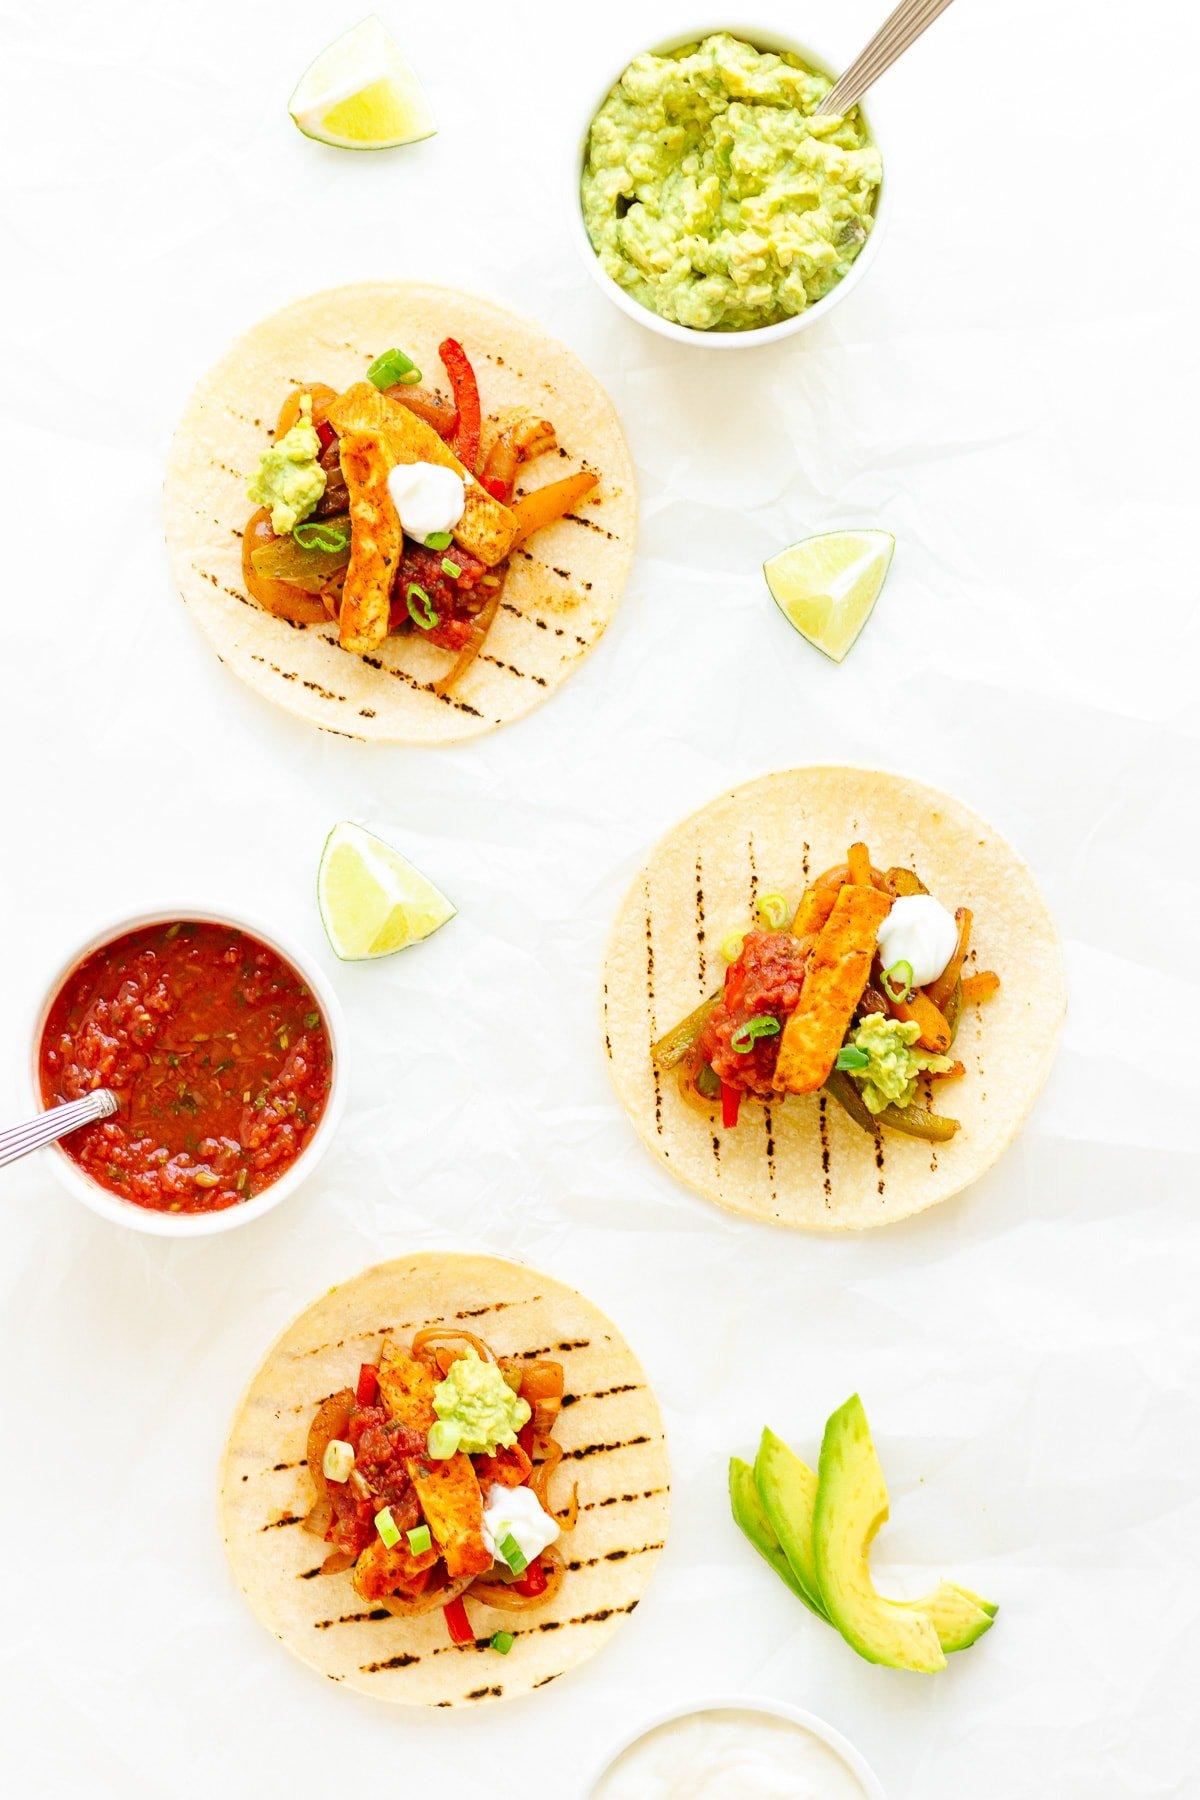 Three halloumi fajitas on a white background with various toppings laid out around them.